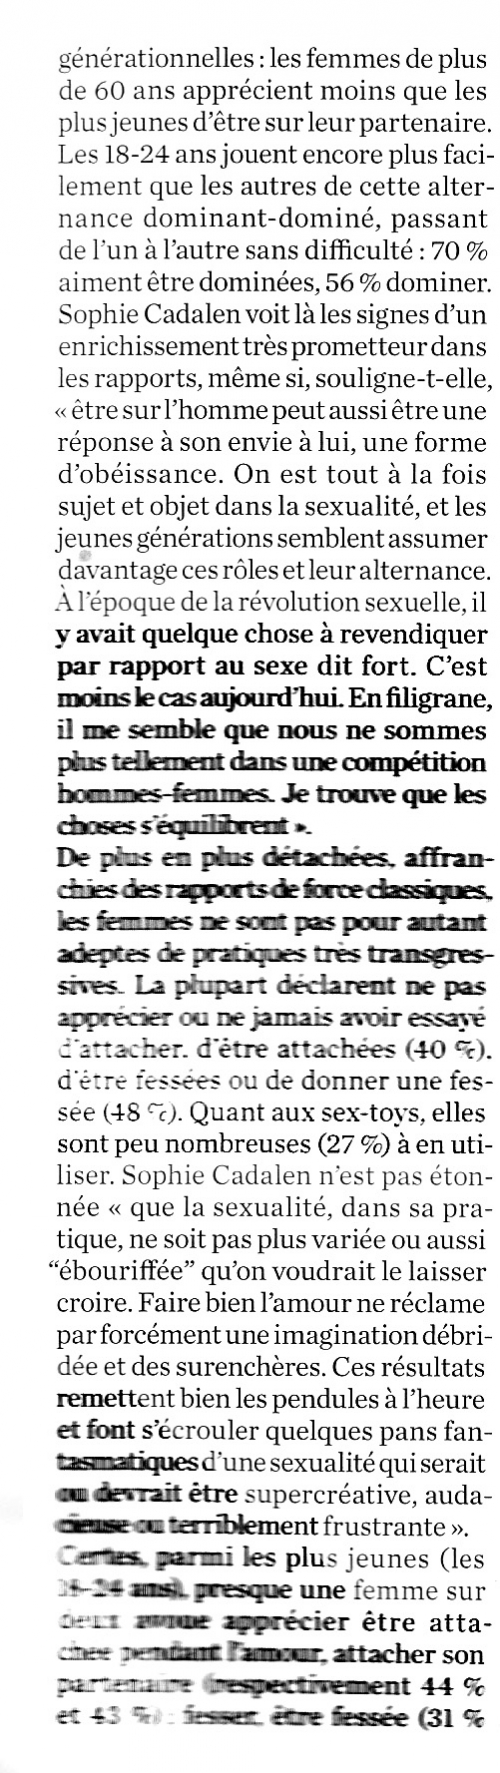 article sexe7.jpg